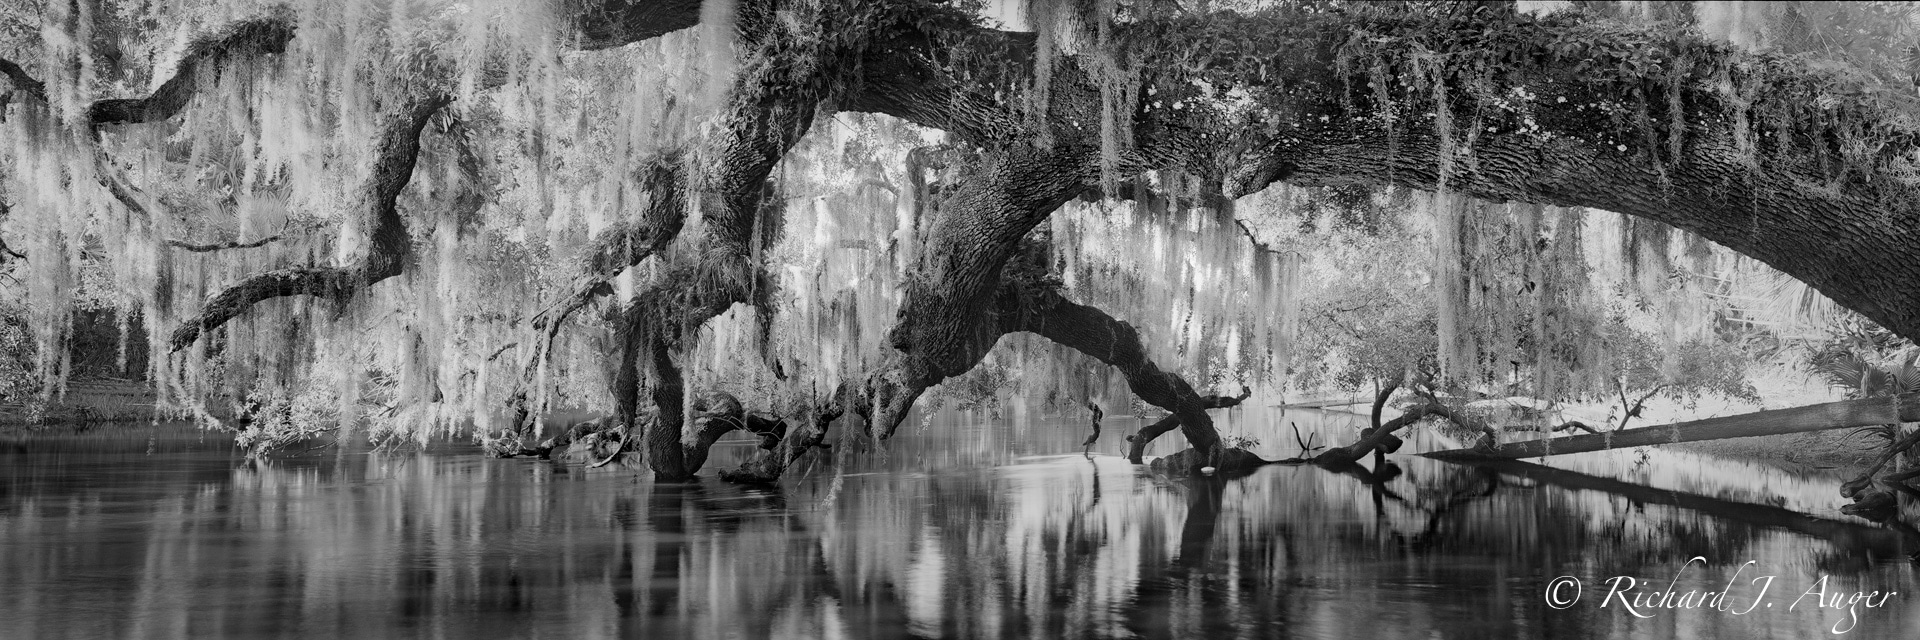 St Johns River, Florida, Oak Tree, Swamp, Moss, Black and White, Panorama, Photographer